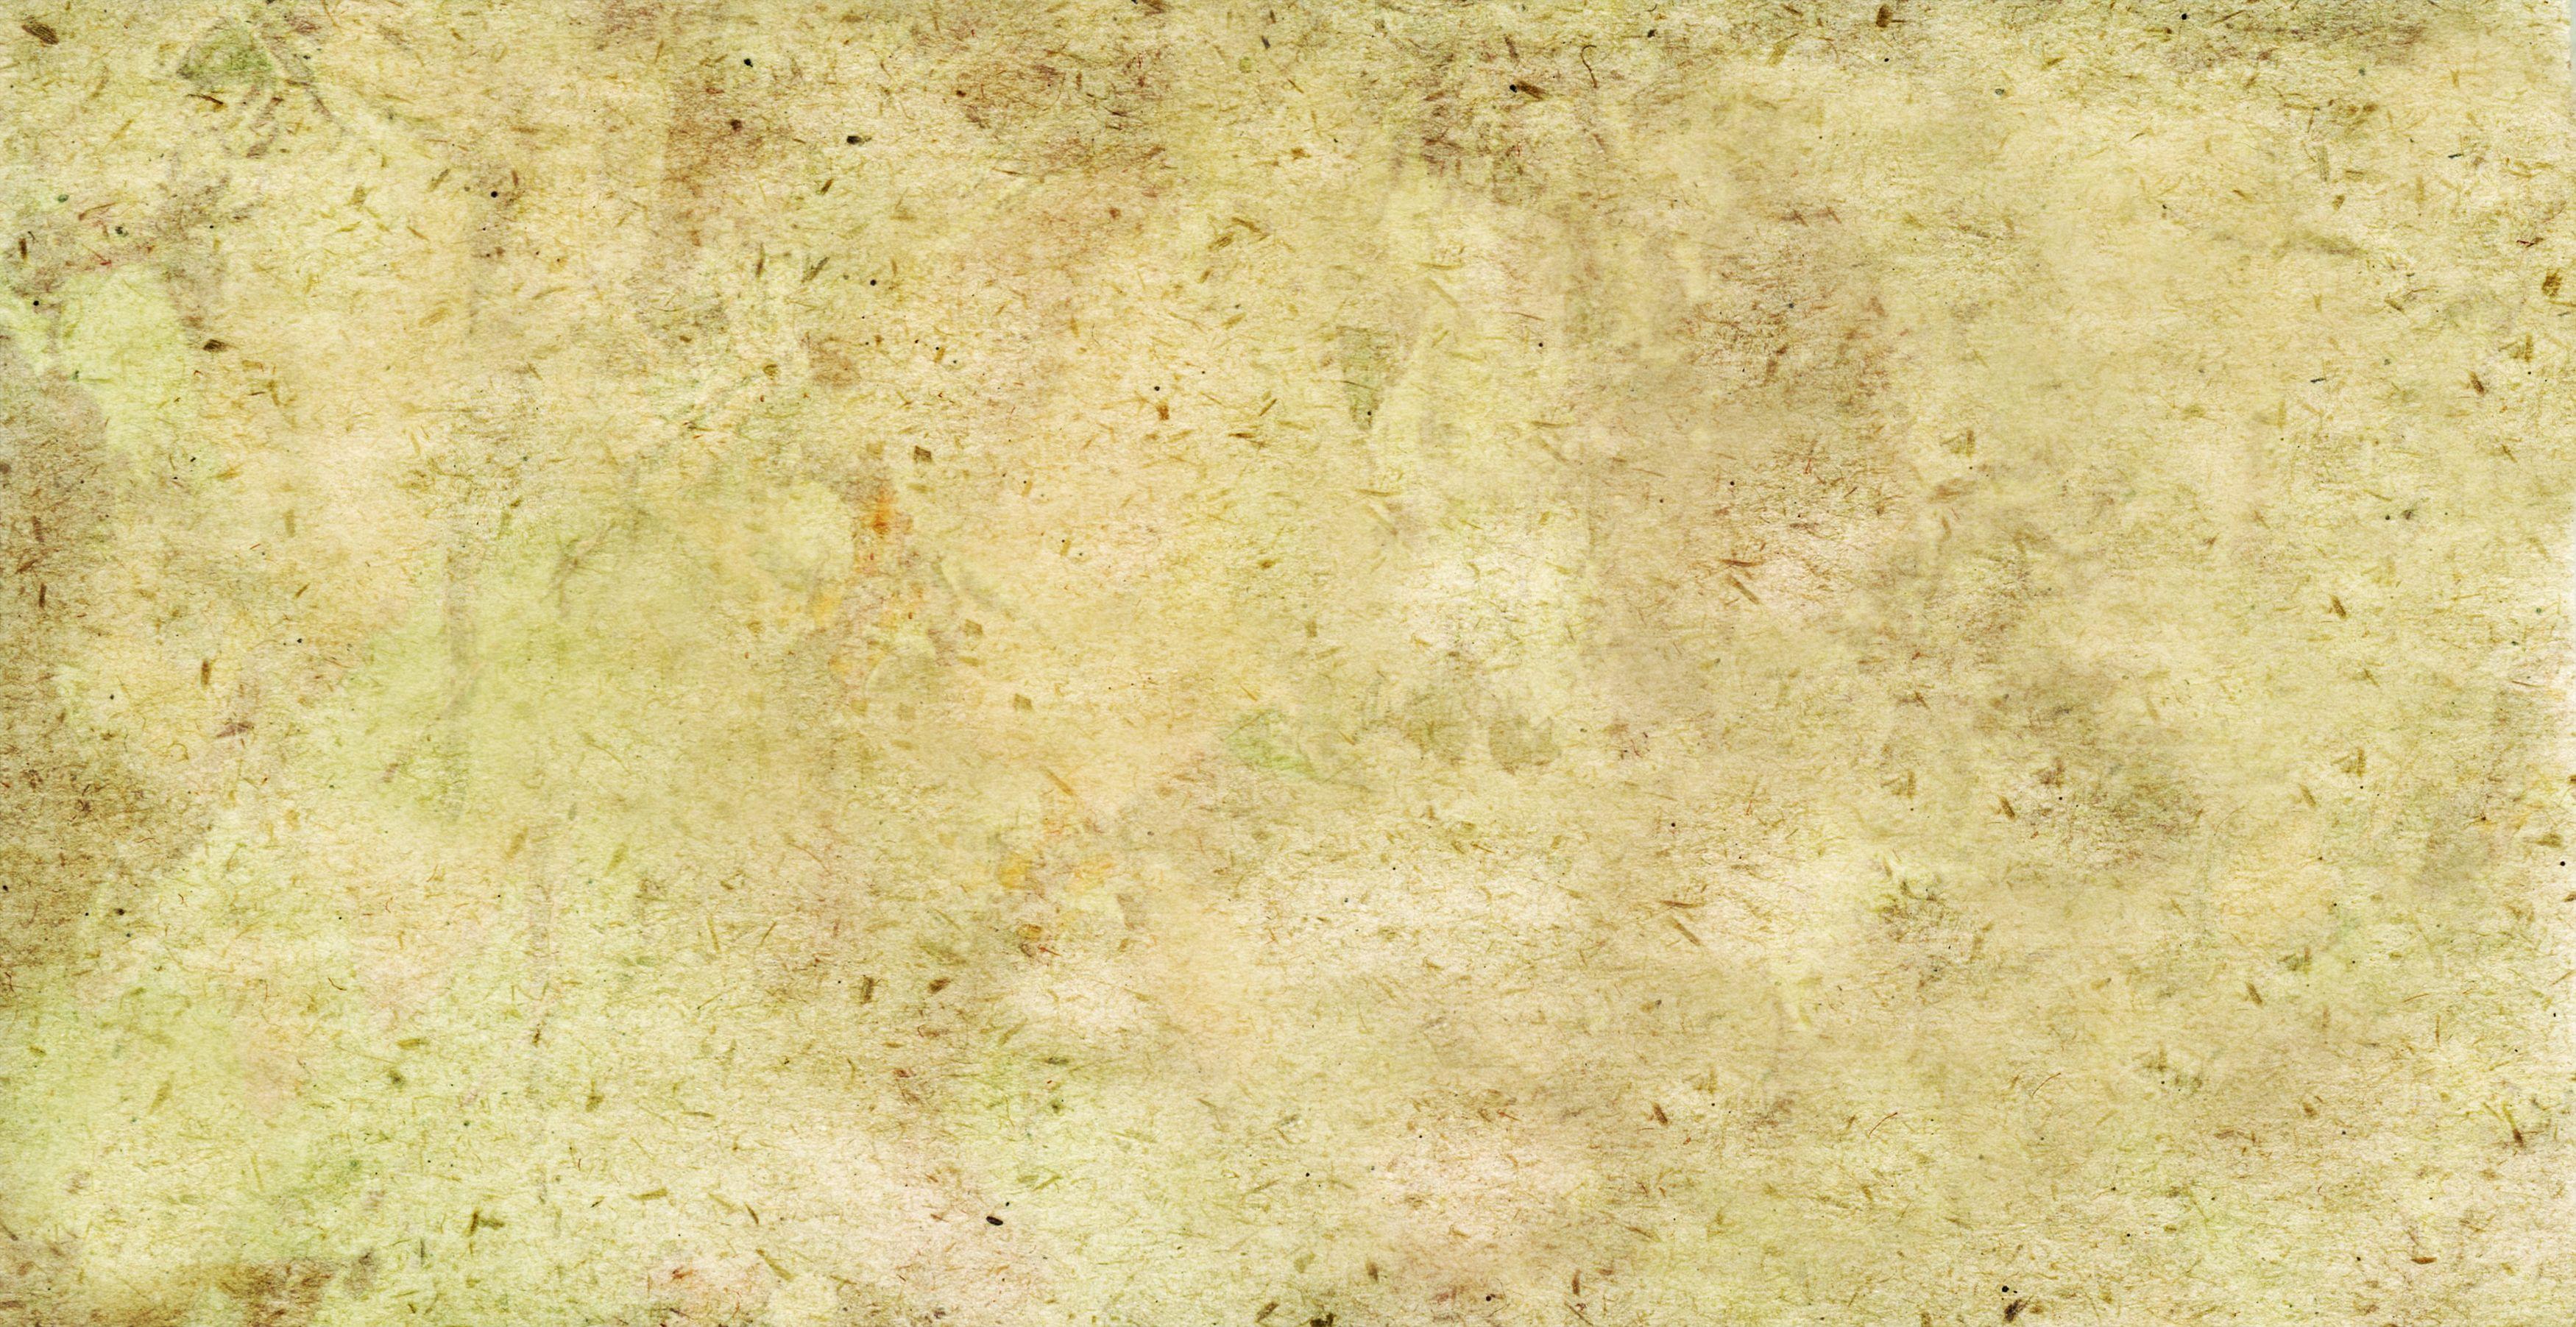 Vintage Cig Paper005 3500x1803 Free Texture BackgroundsVintage GrungePaper